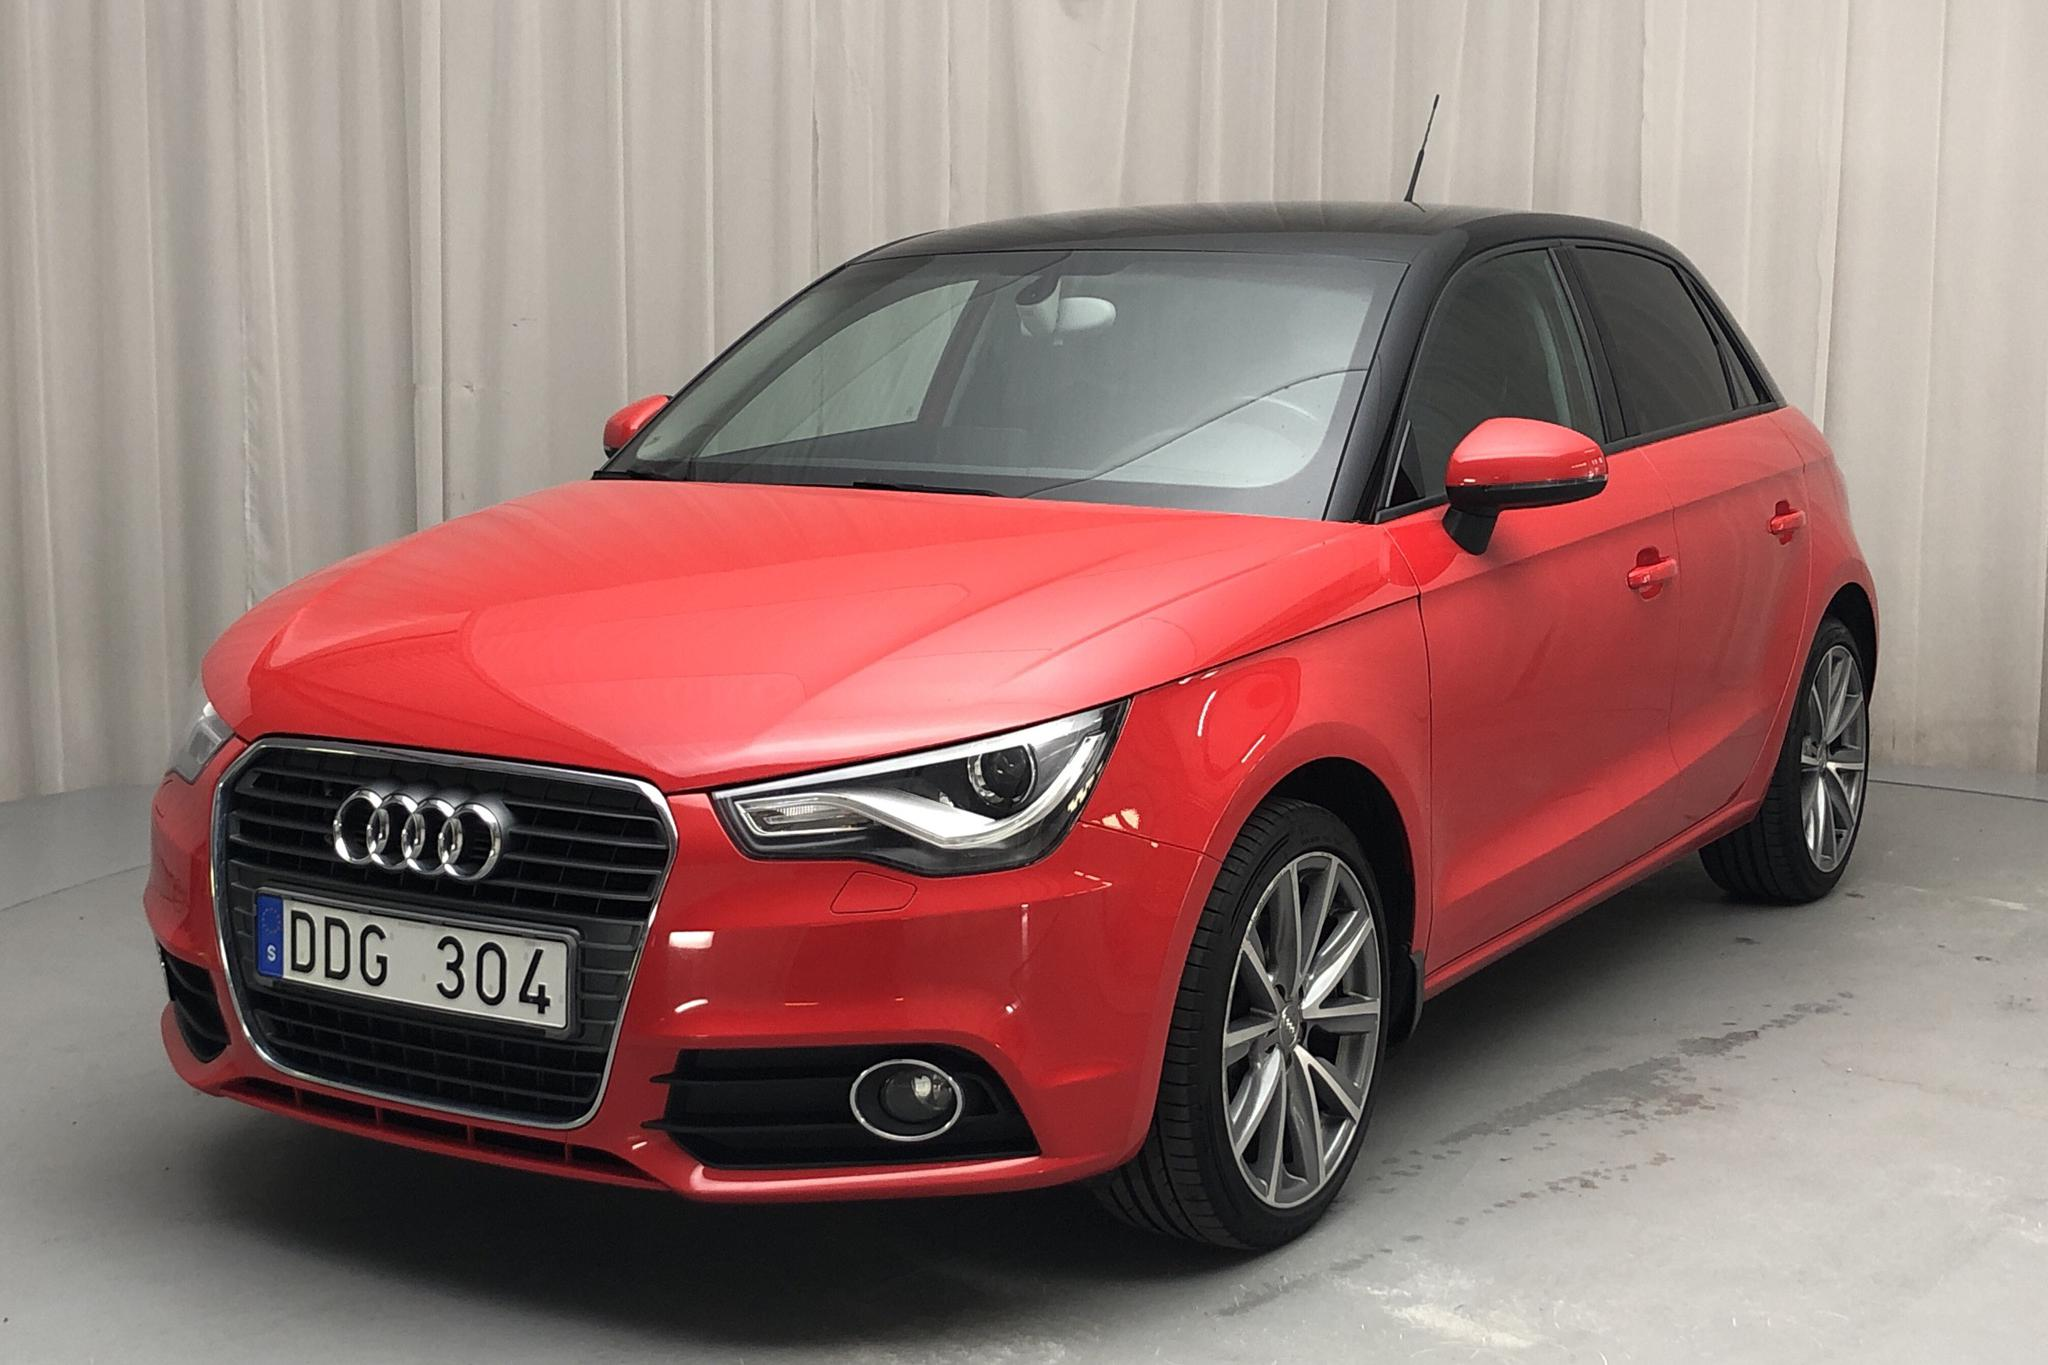 Audi A1 1.4 TFSI Sportback (140hk) - 10 478 mil - Manuell - röd - 2014